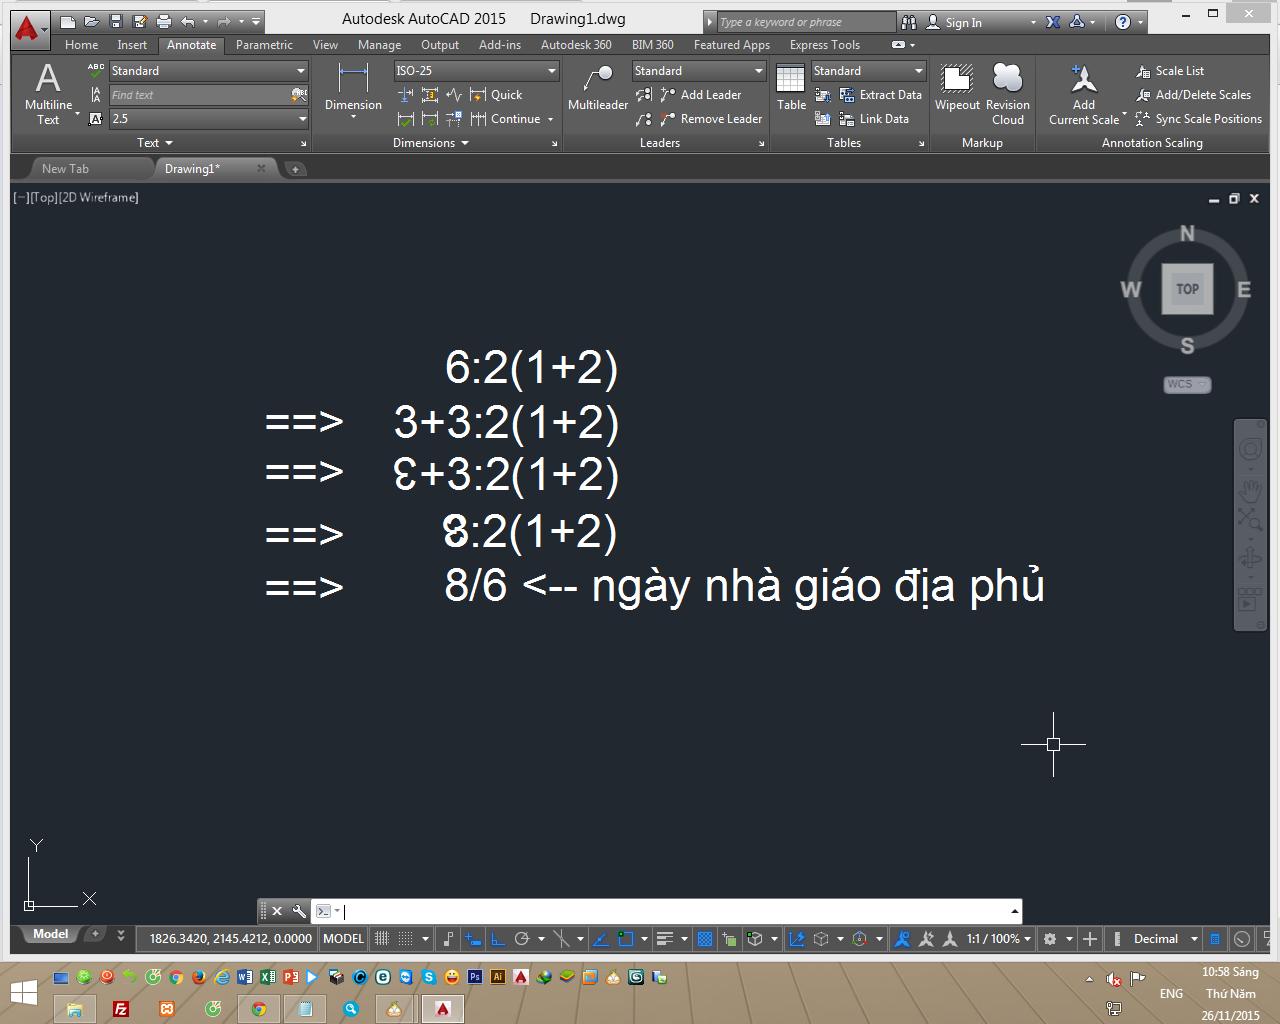 110802_screenshot_21.png